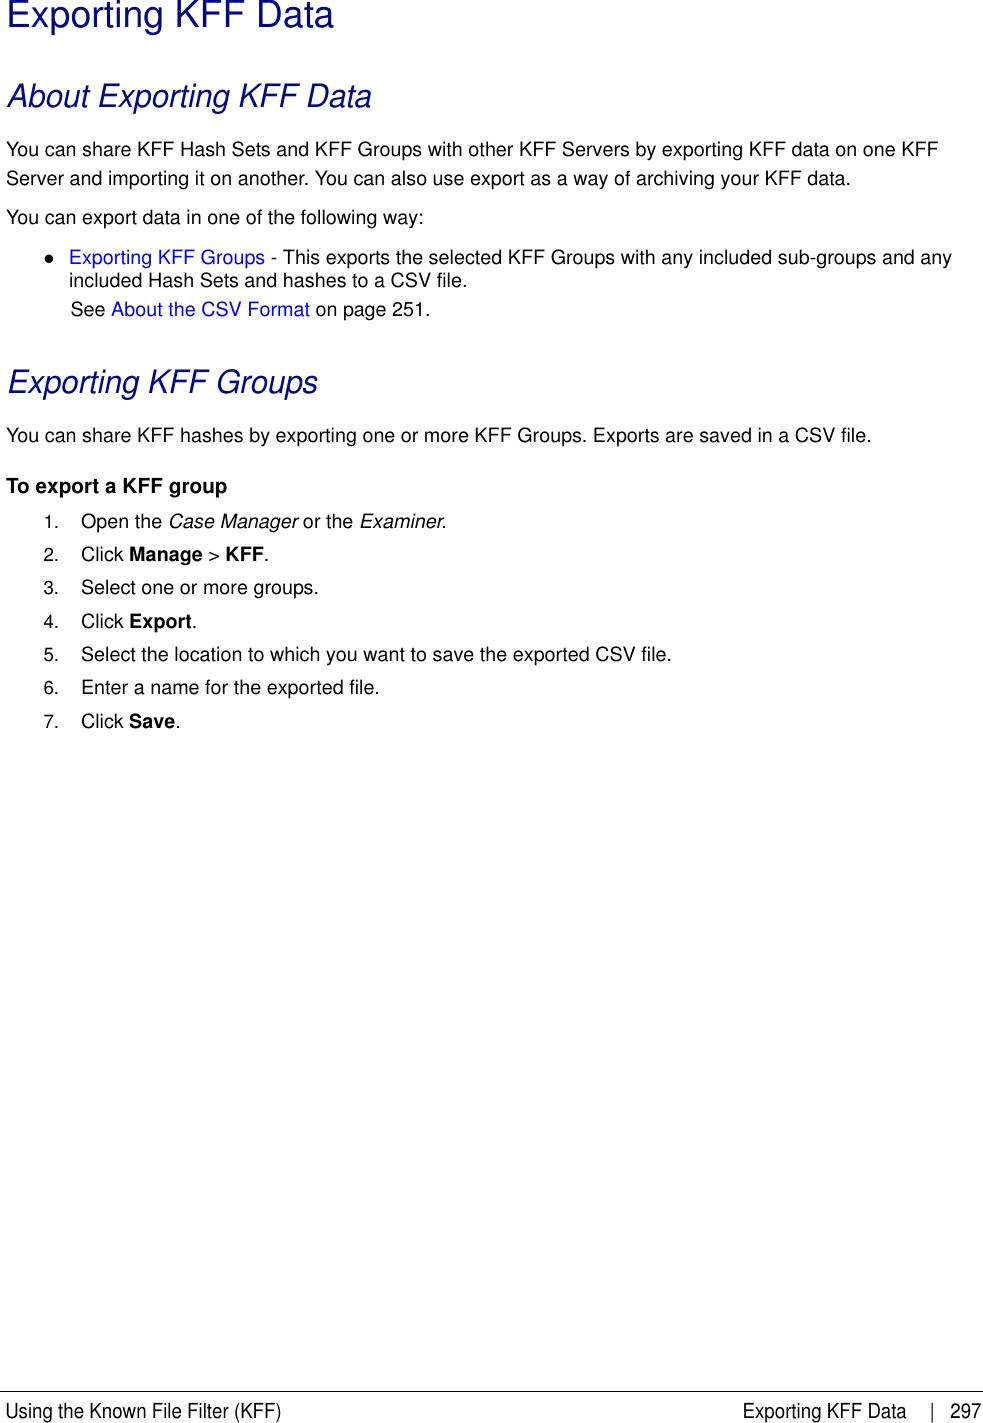 FTK_User_Guide FTK UG